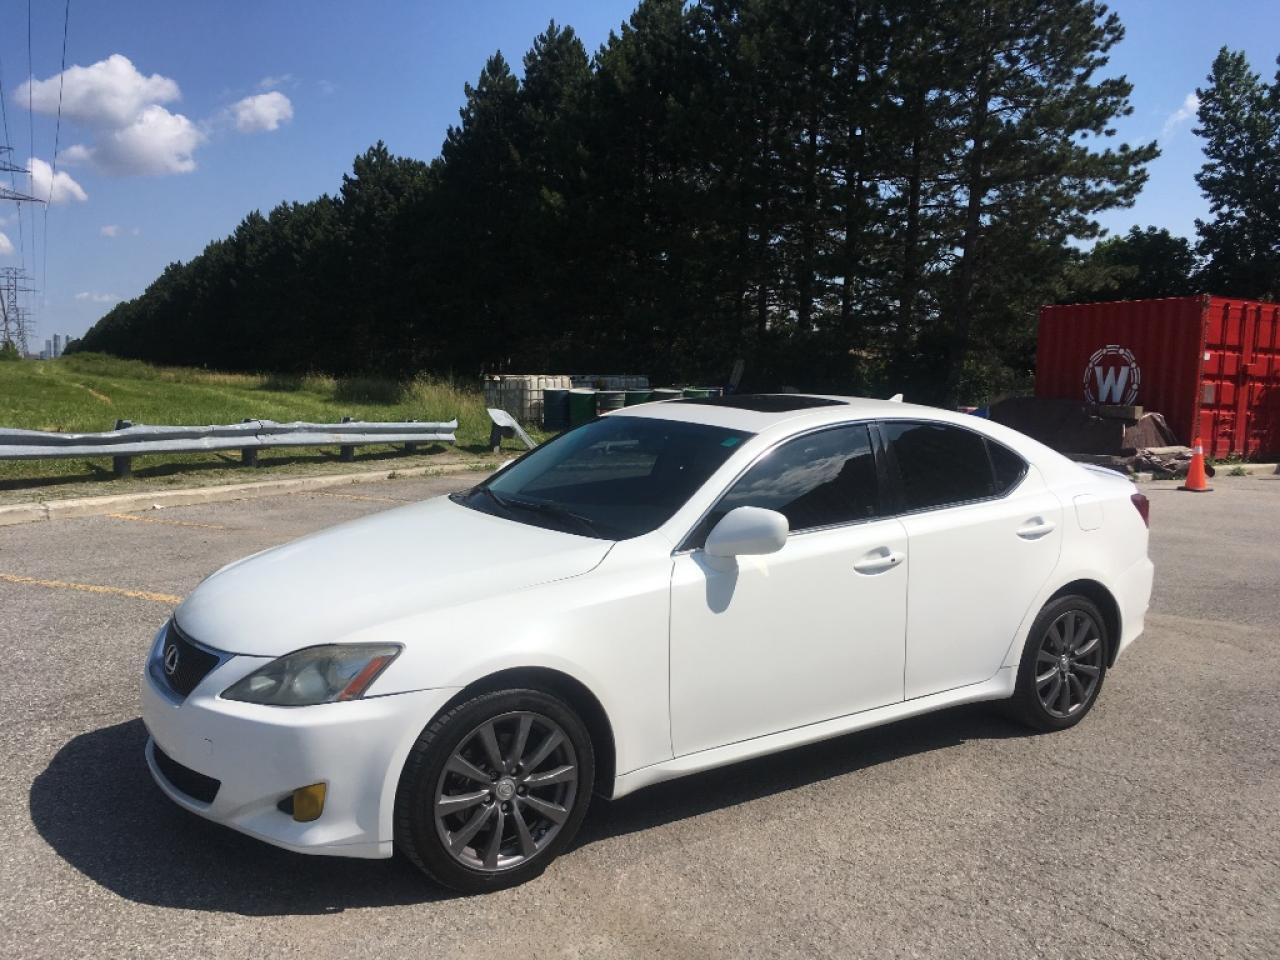 2008 Lexus IS 250. WHITE